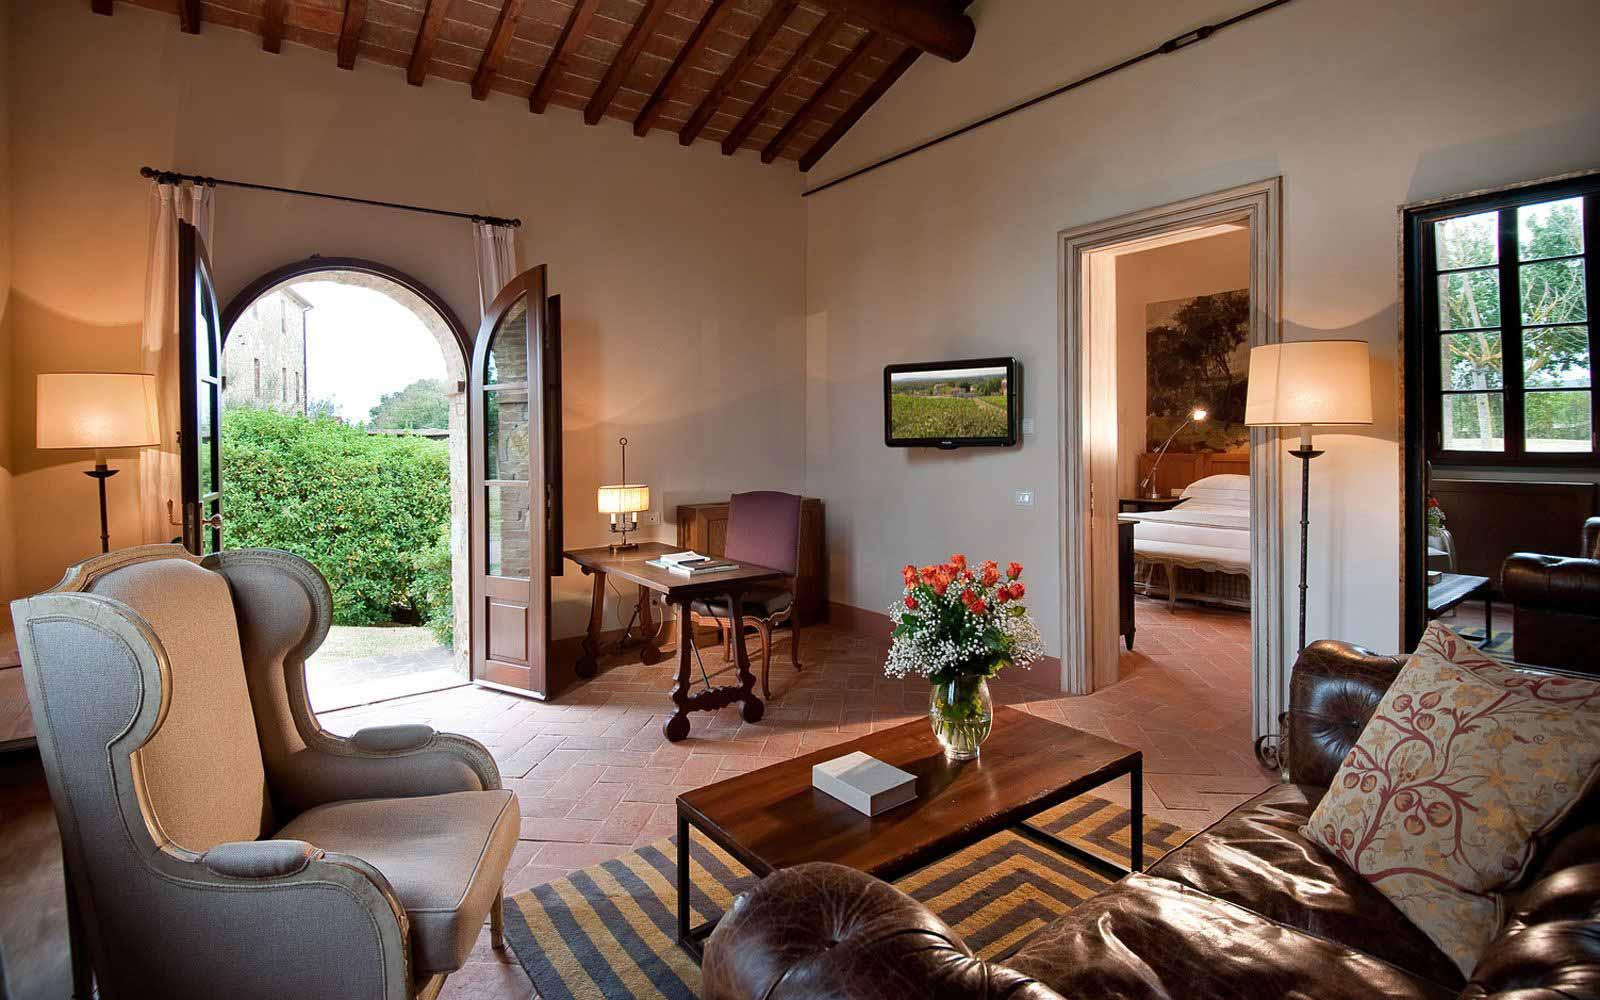 Royal Suite at Castel Monastero Tuscan Resort & Spa